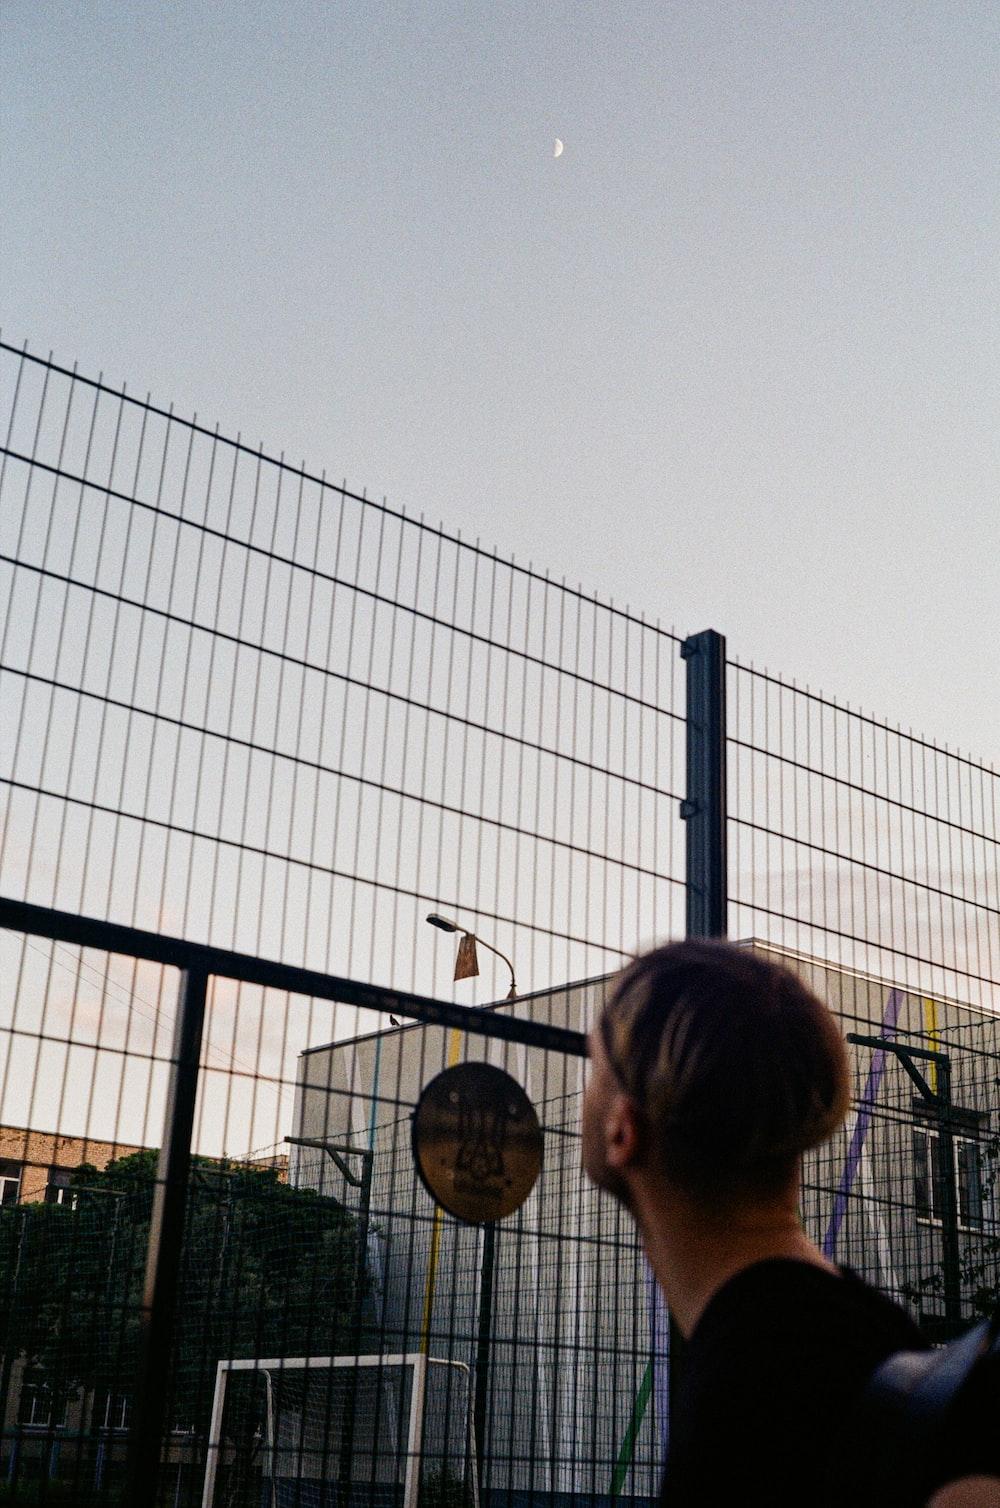 woman in black shirt standing near black metal fence during daytime